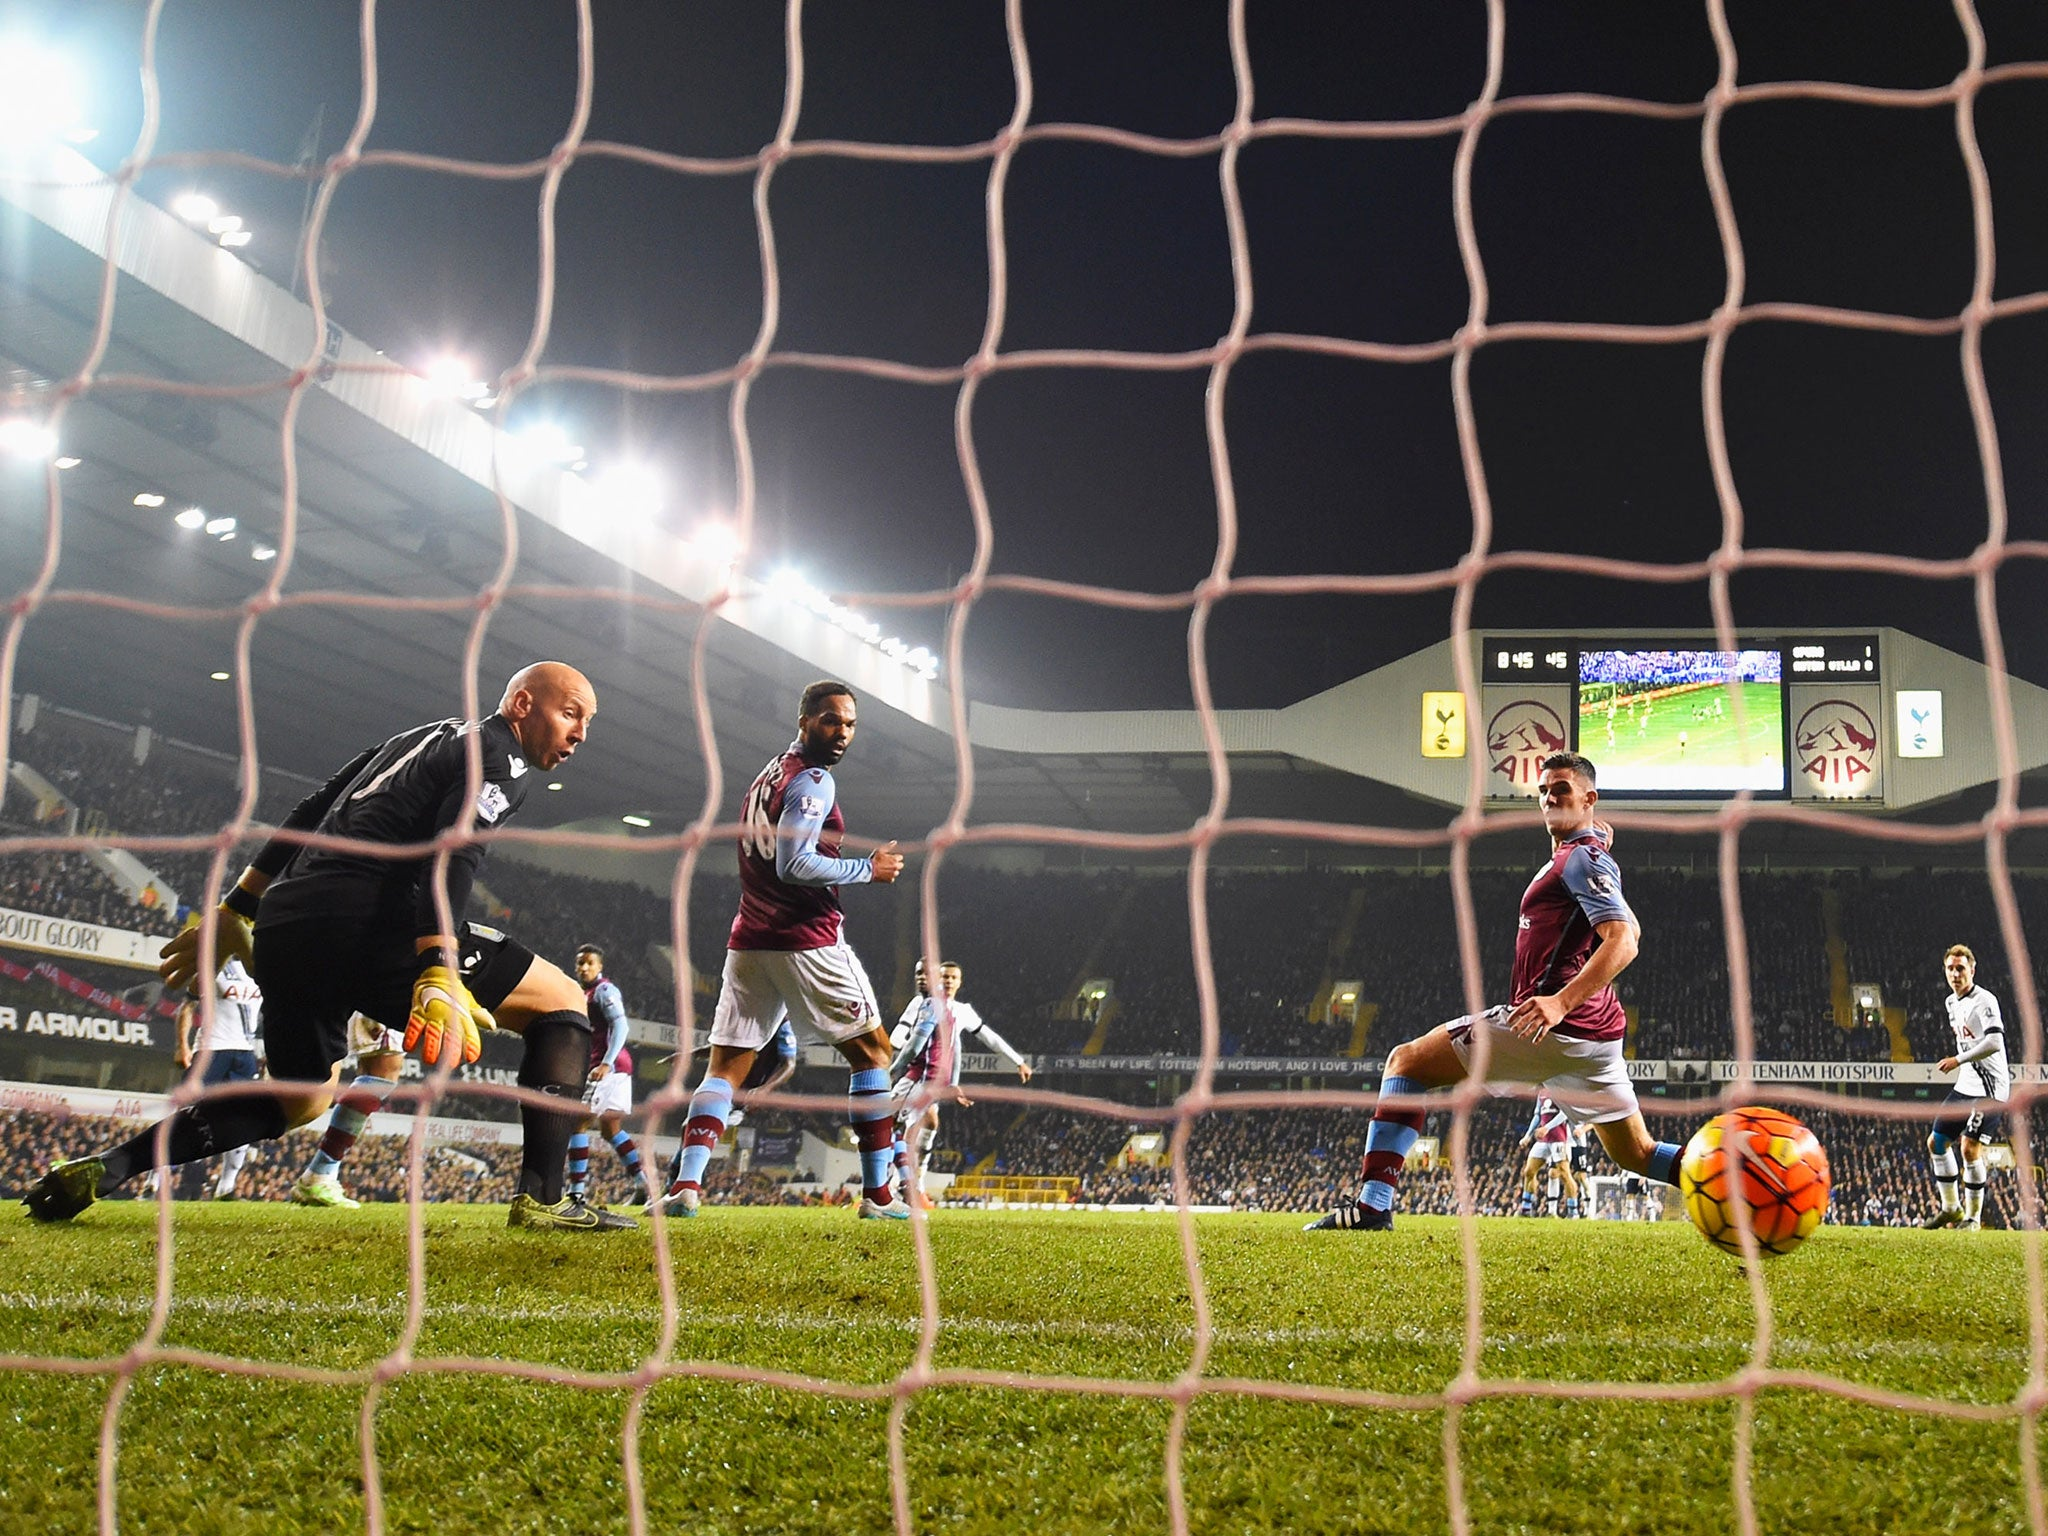 Tottenham vs Aston Villa match report: Spurs win despite spirited fight-back under the gaze of Remi Garde